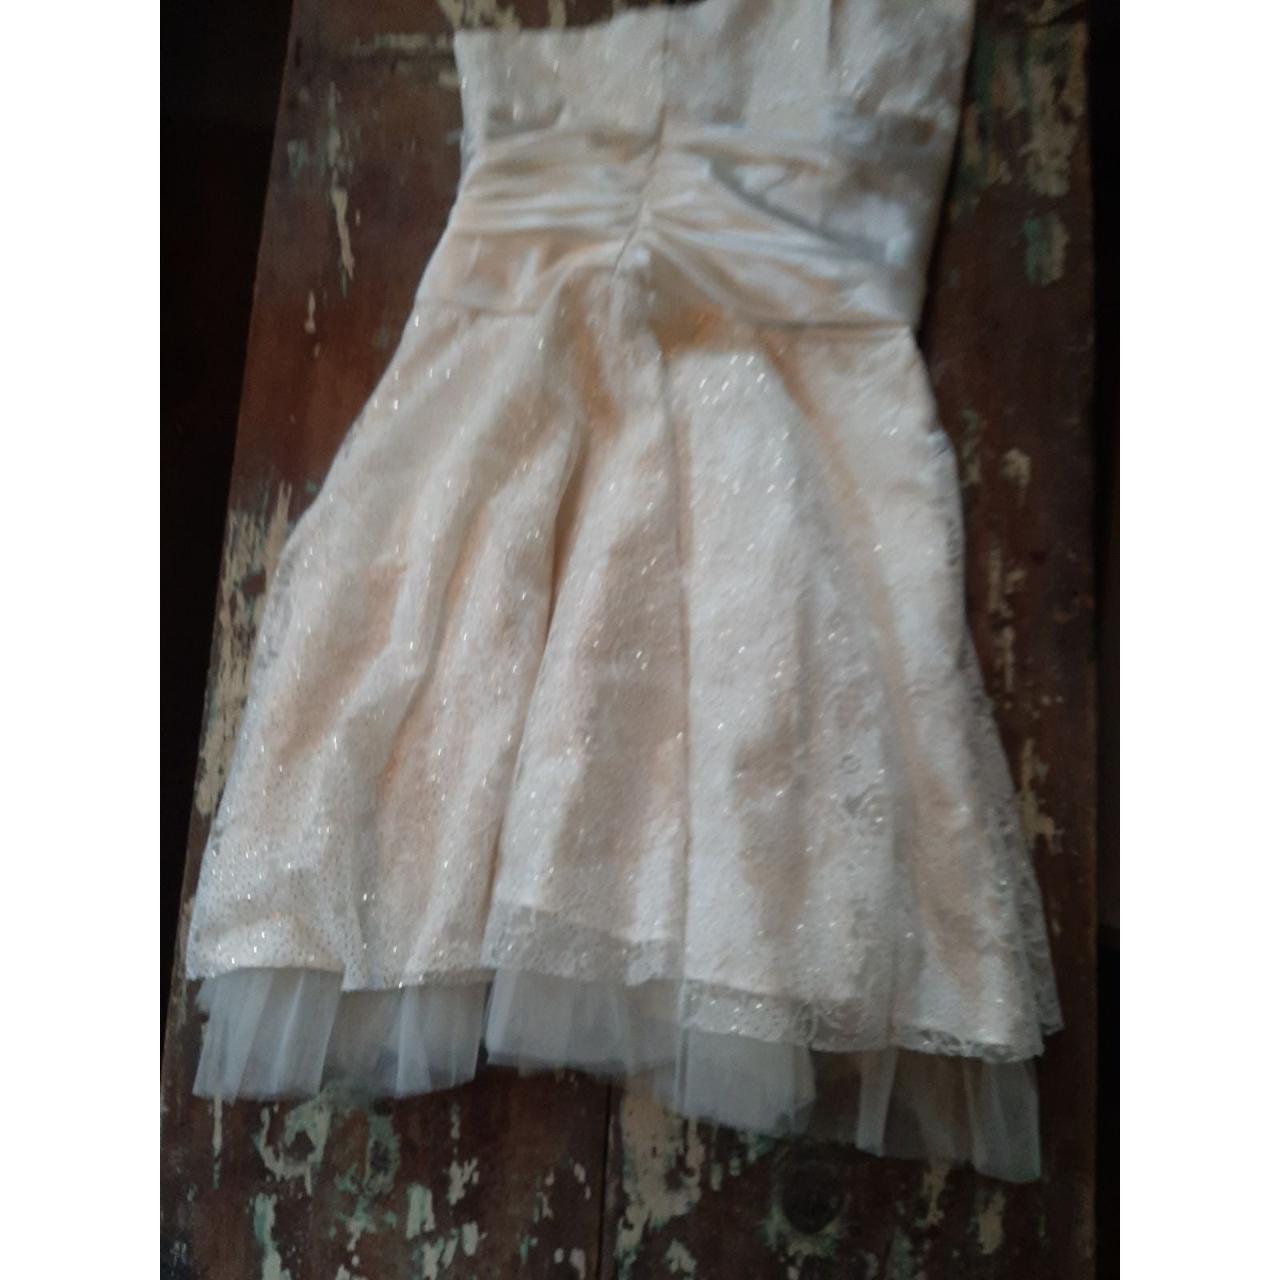 Product Image 1 - Masquerade girls dress size 7/8